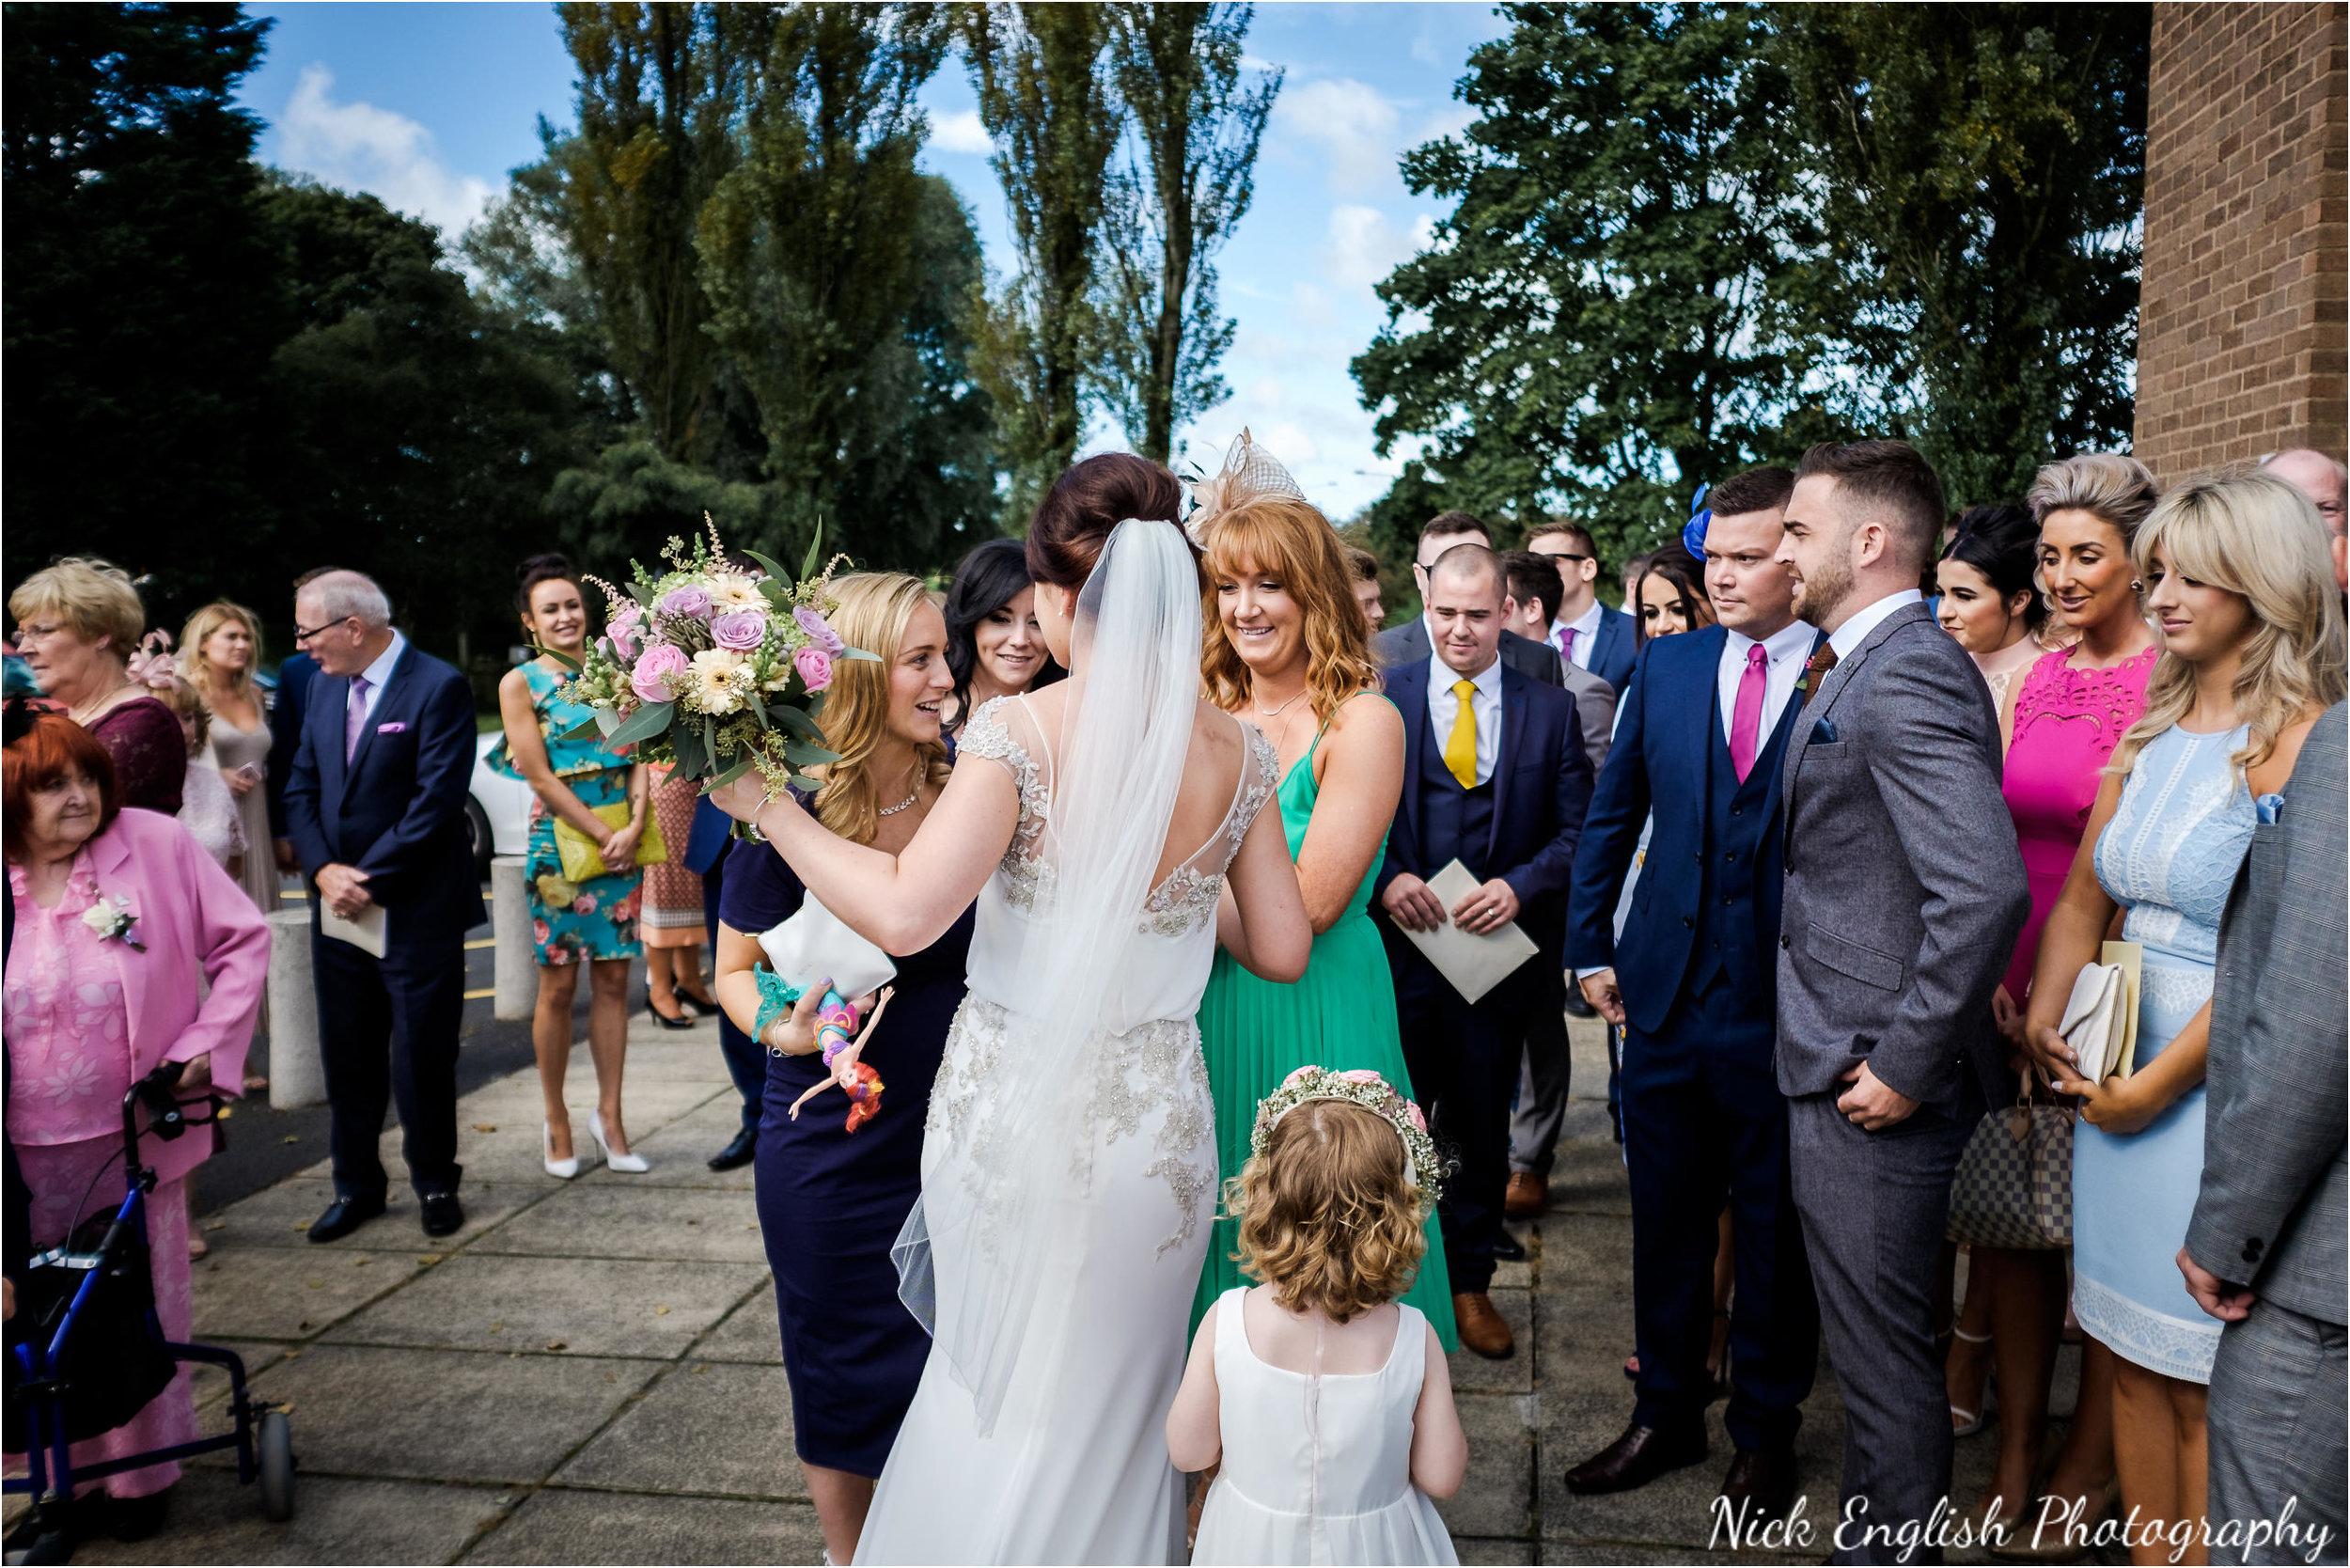 Stacey-Ash-Wedding-Photographs-Stanley-House-Preston-Lancashire-84.jpg